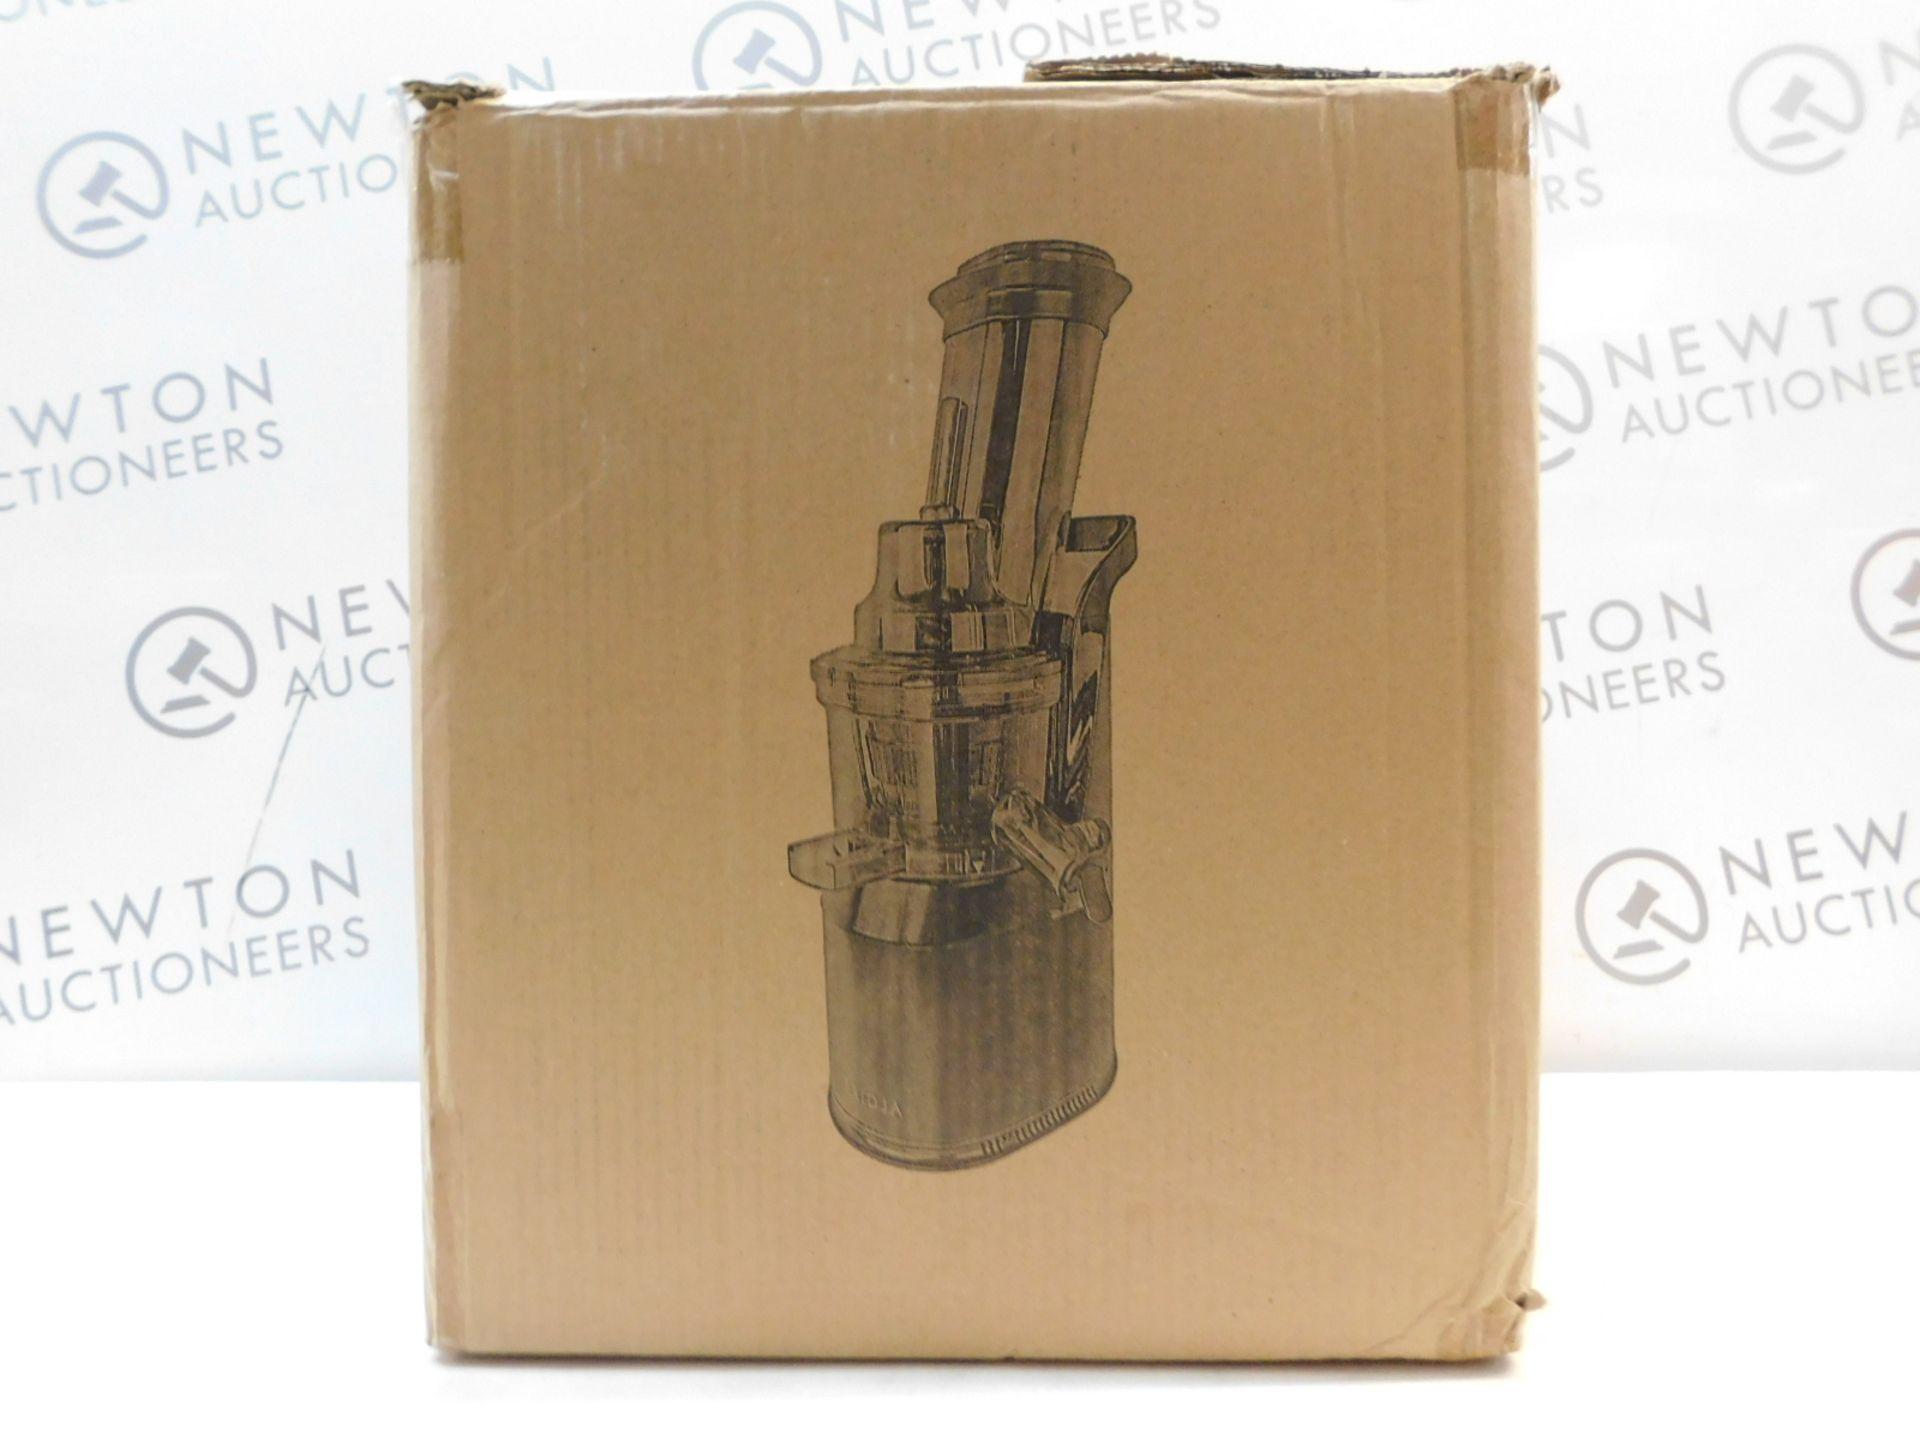 1 BOXED FRIDJA F1900 BLK 240W POWERFUL MASTICATING JUICER RRP £149.99